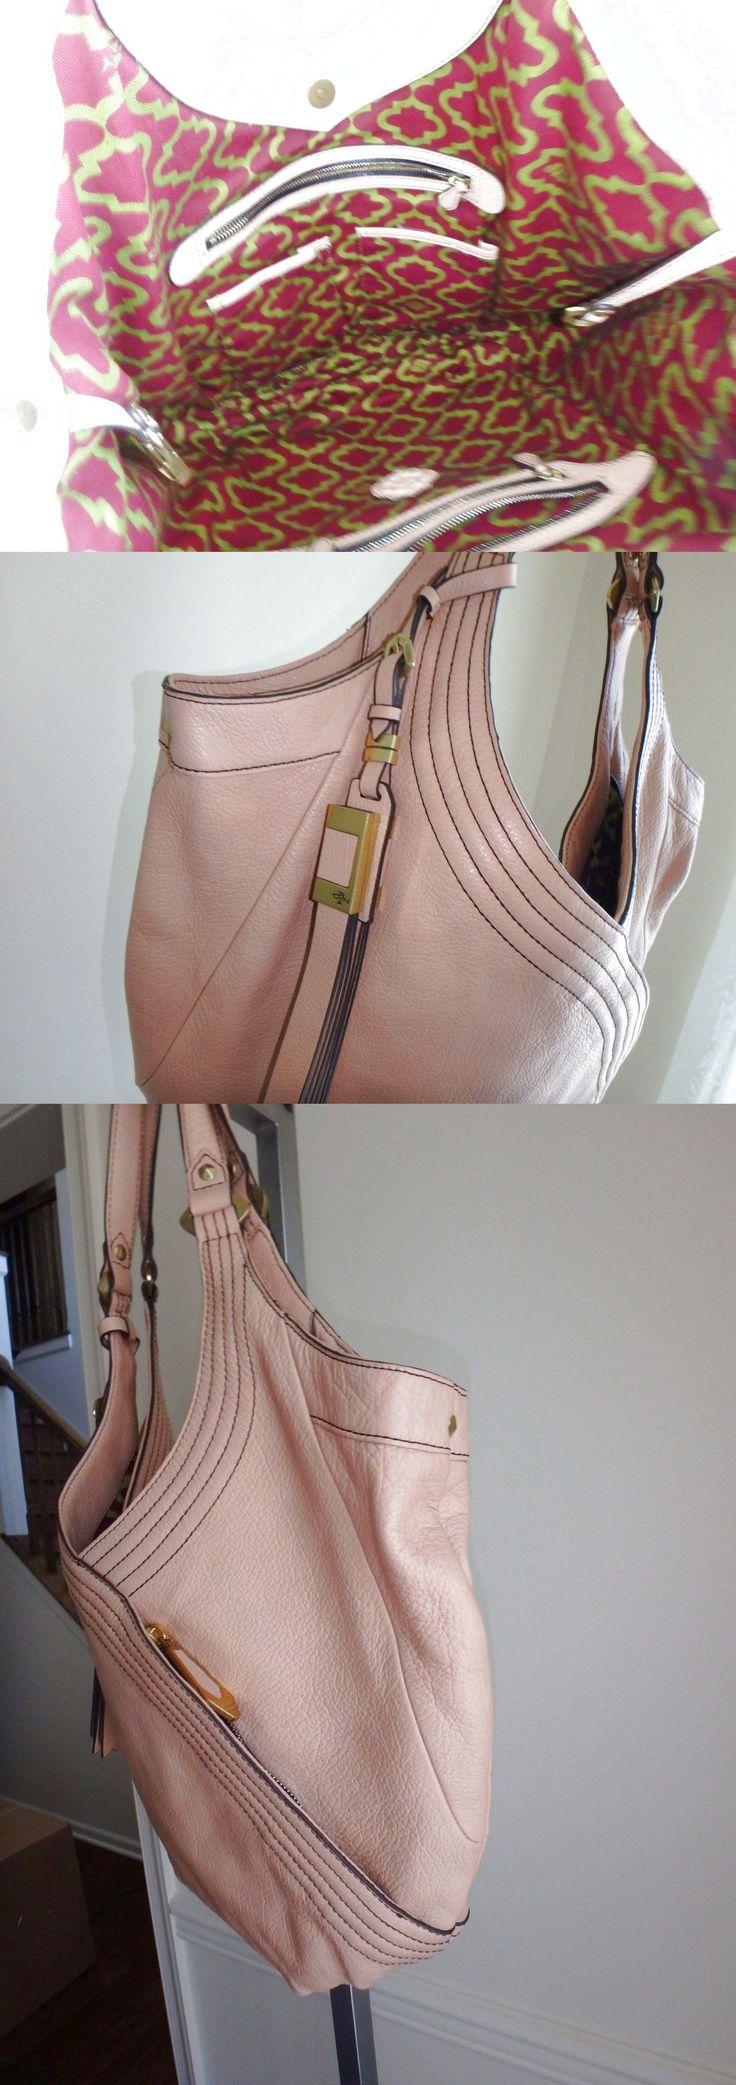 ORYANY ITALIAN GRAIN LEATHER HOBO BAG PURSE TRACY ALMOND NEW $92.99